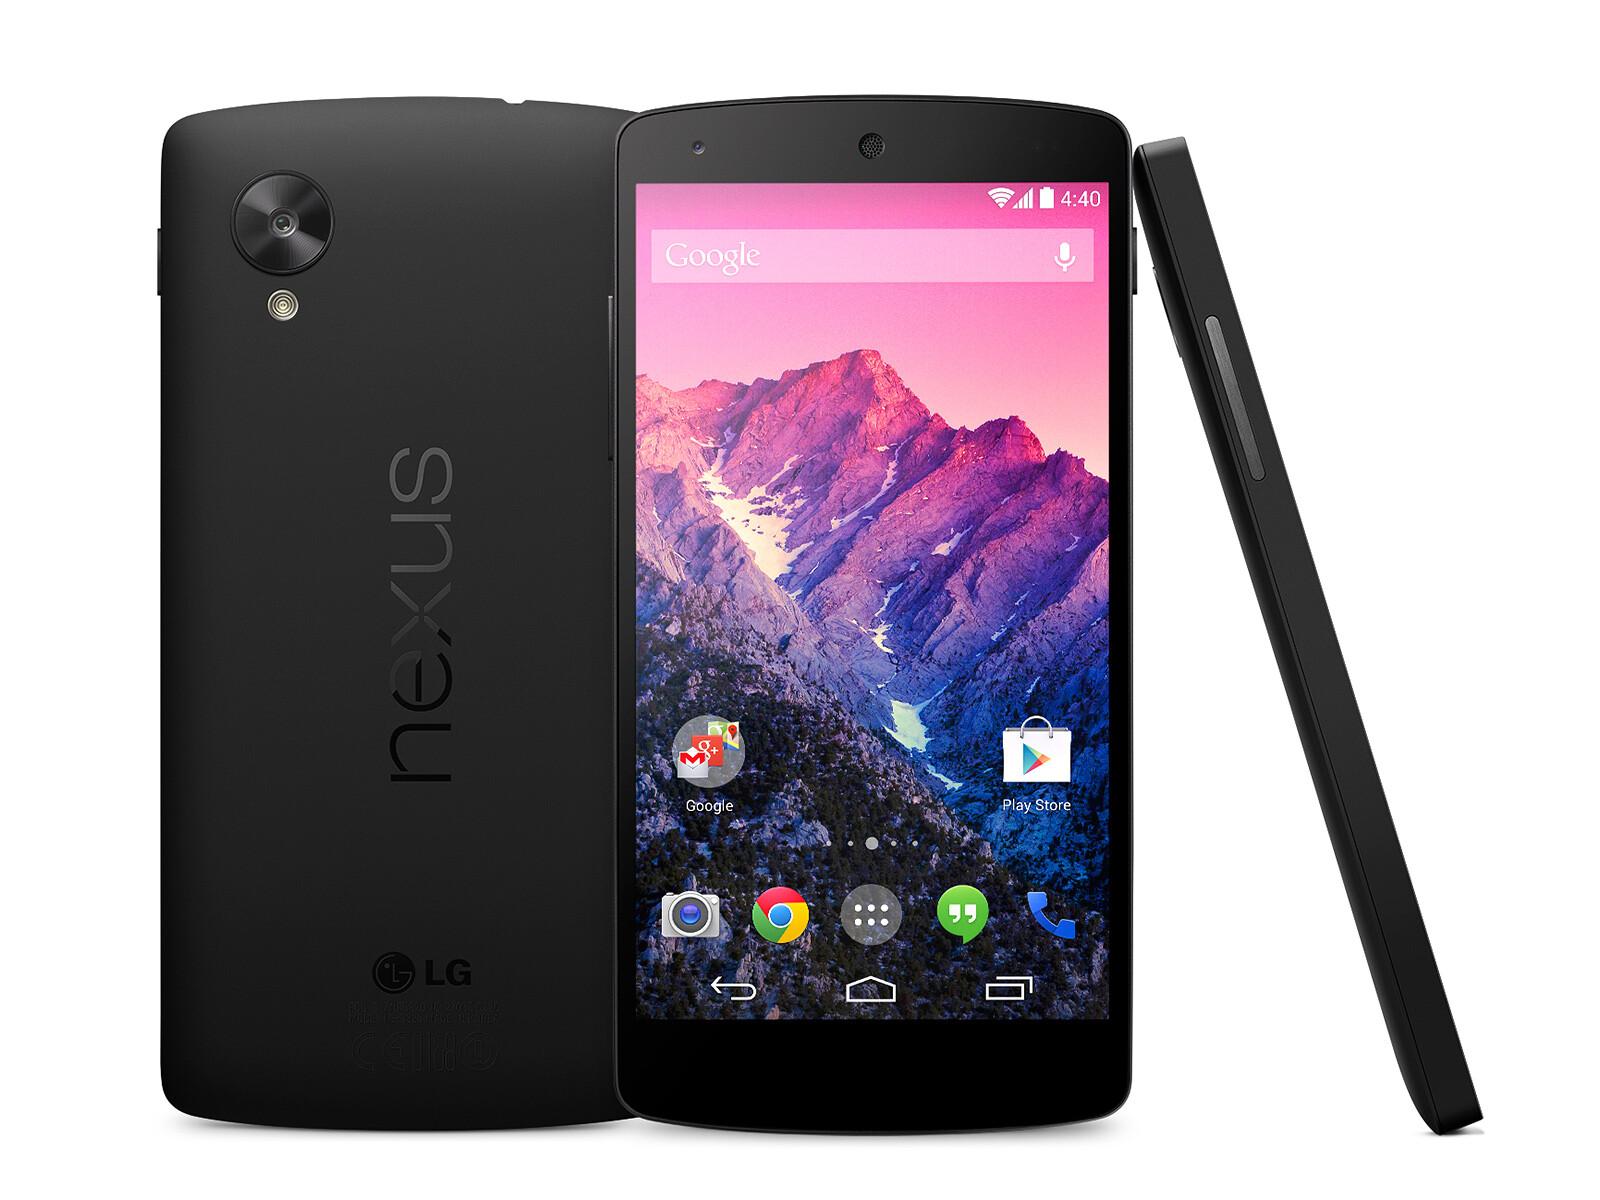 Google Nexus 5 specs